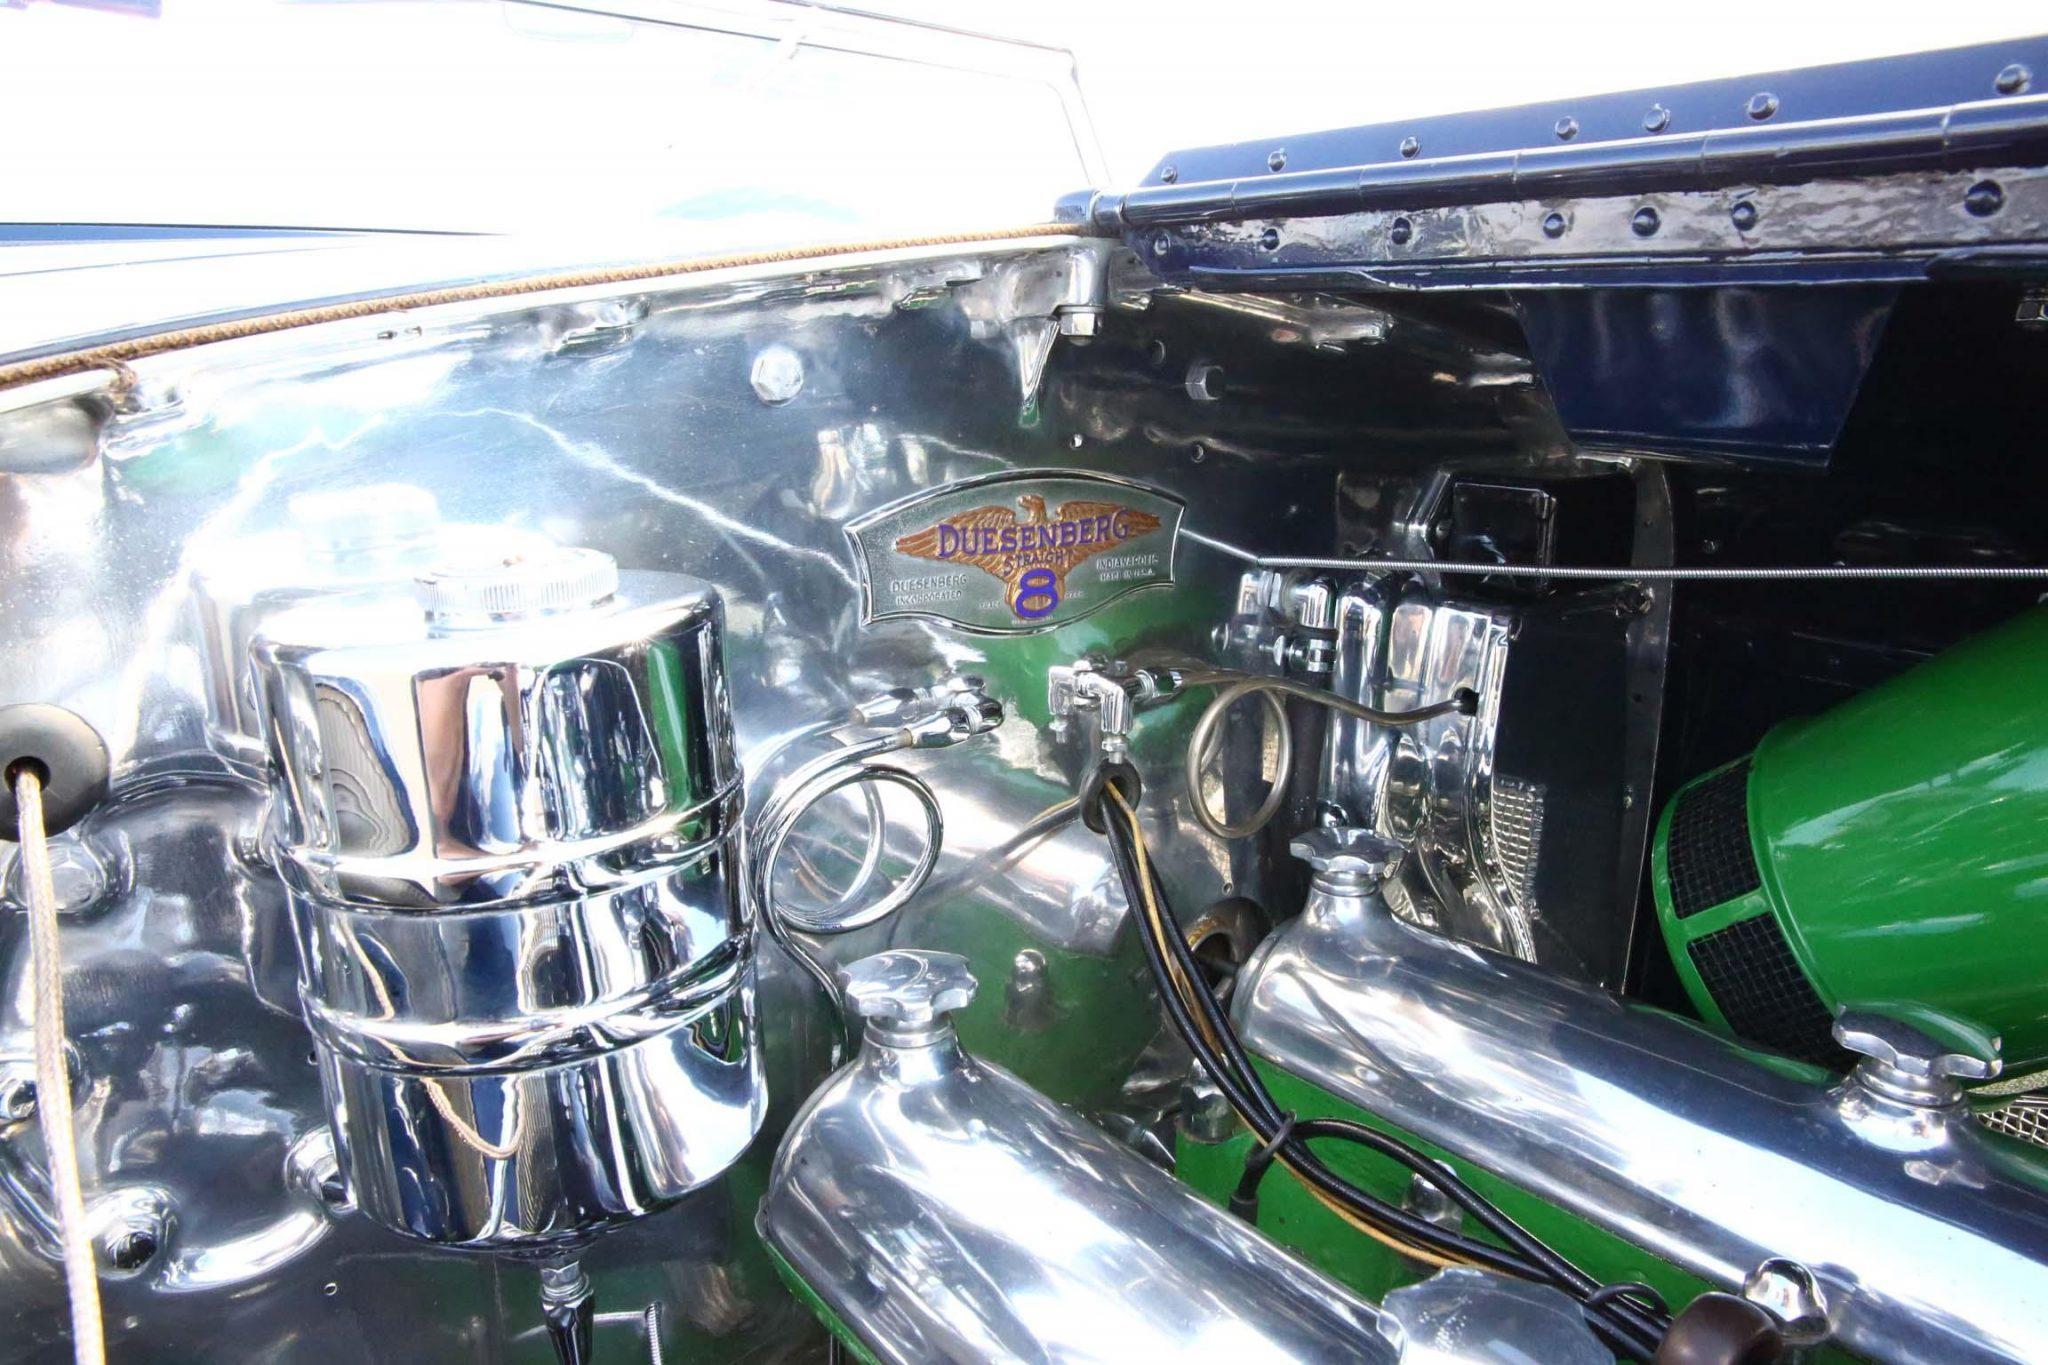 1935 Duesenberg Model JN Convertible Sedan by Rollston engine